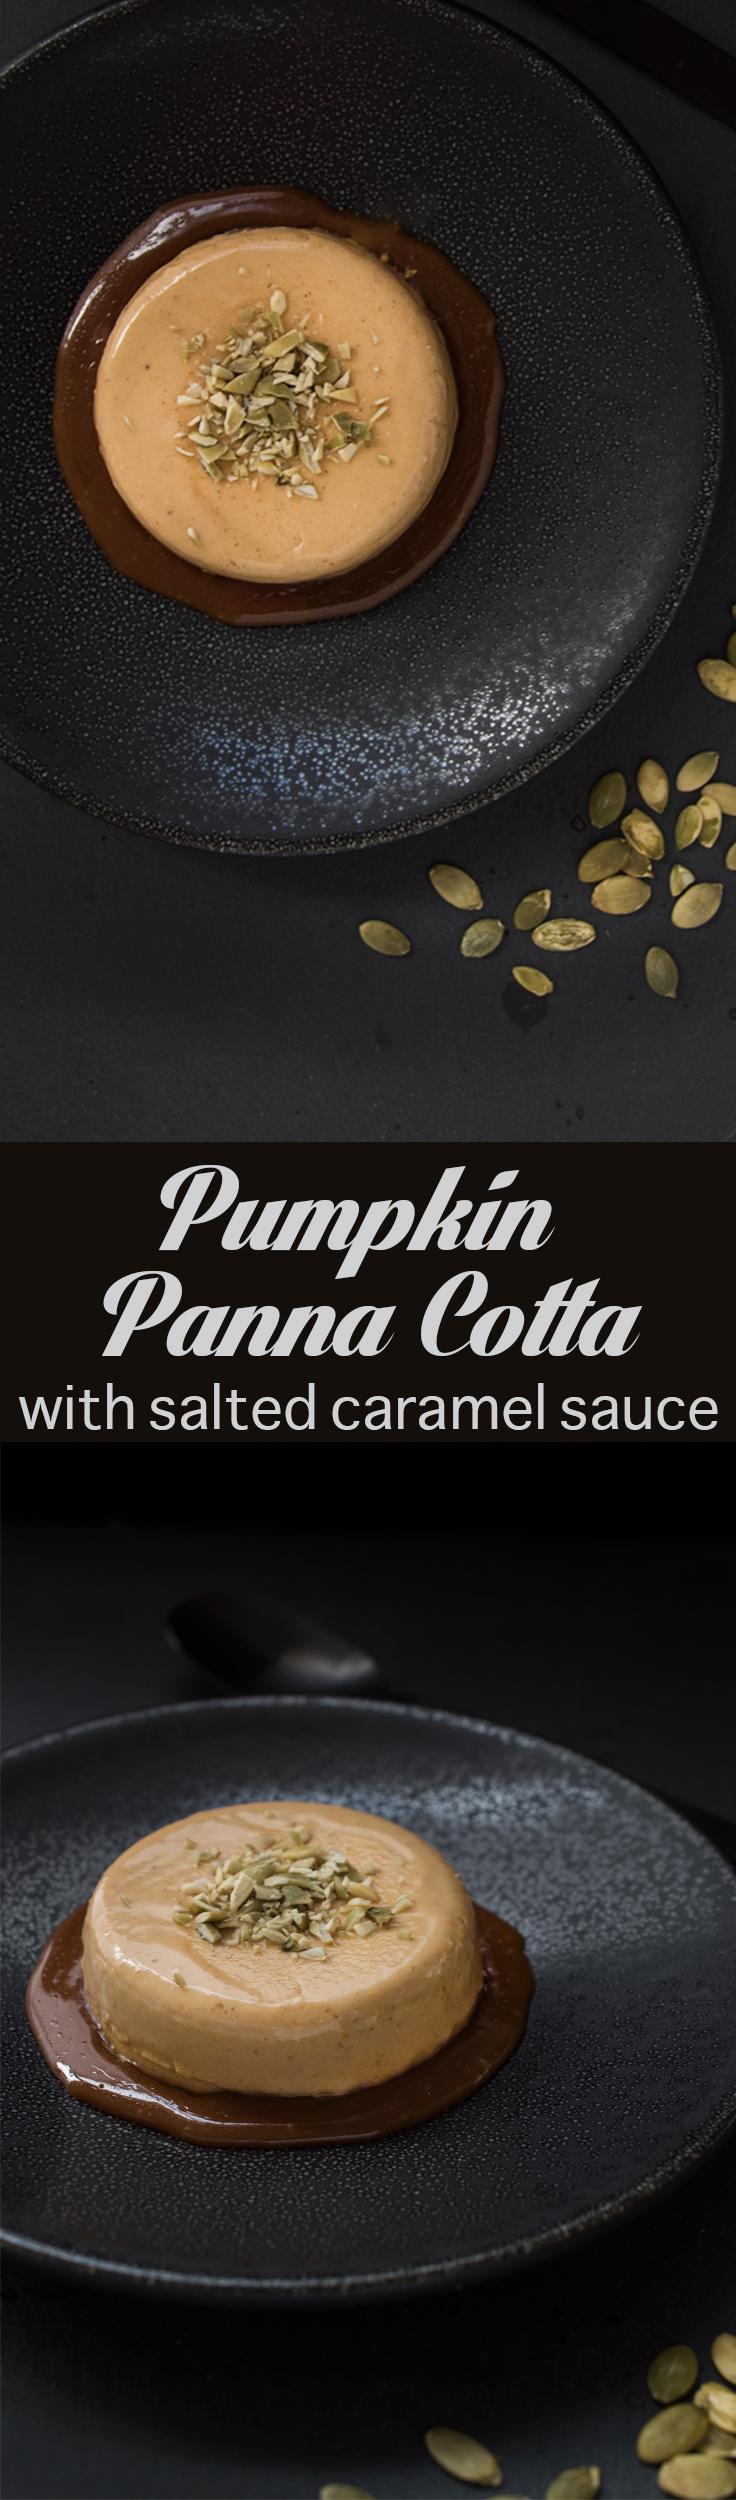 Incredibly creamy Pumpkin Panna Cotta with a Salted Caramel Sauce